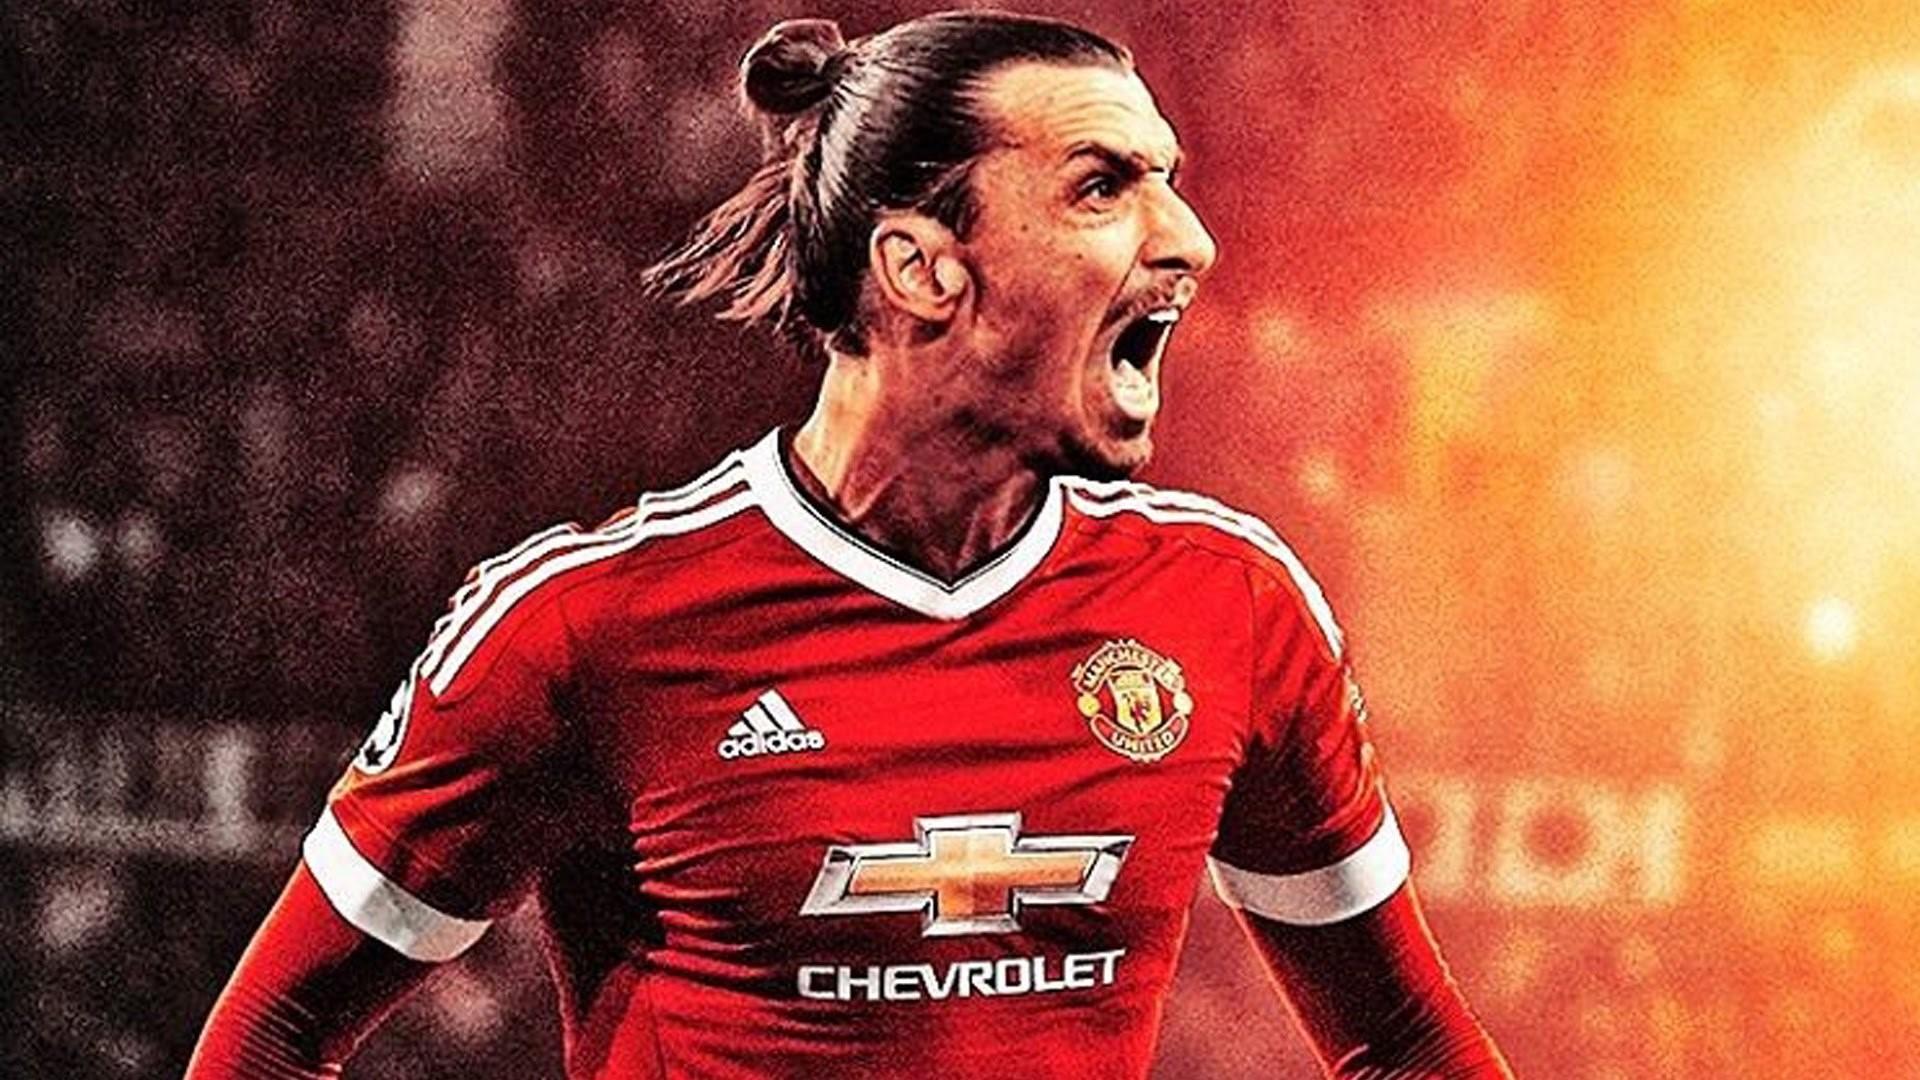 Zlatan Ibrahimovic Background images